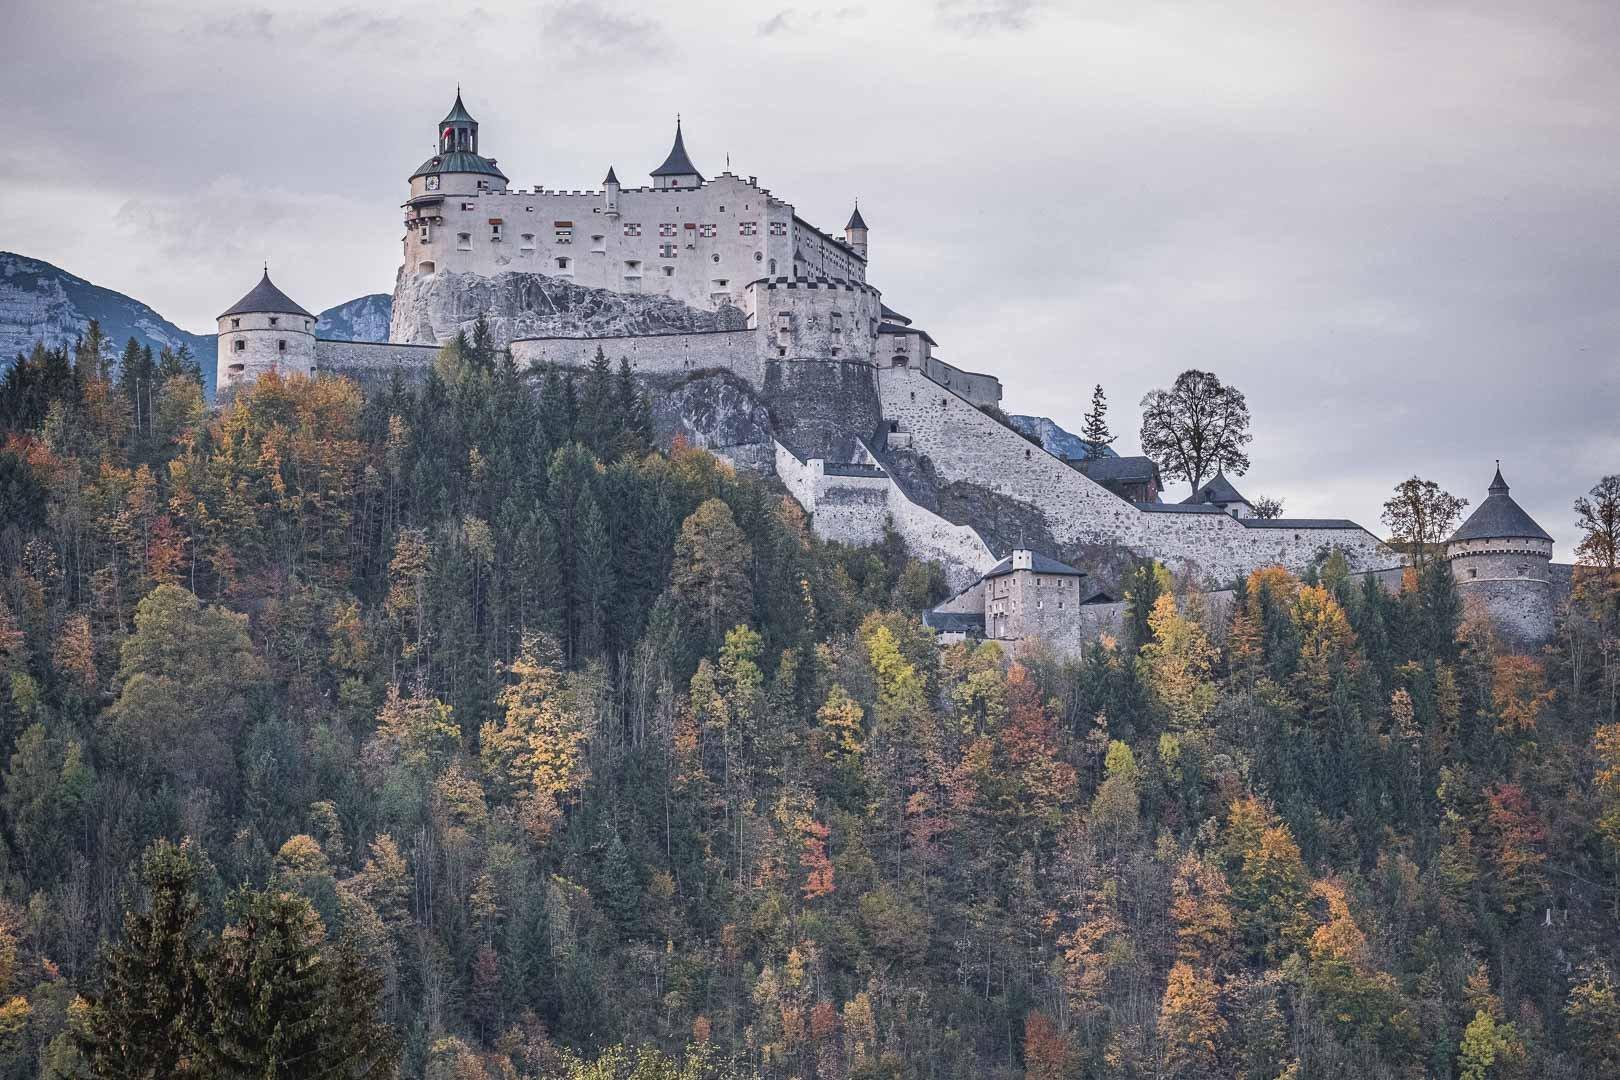 Hohenwerfen Fortress